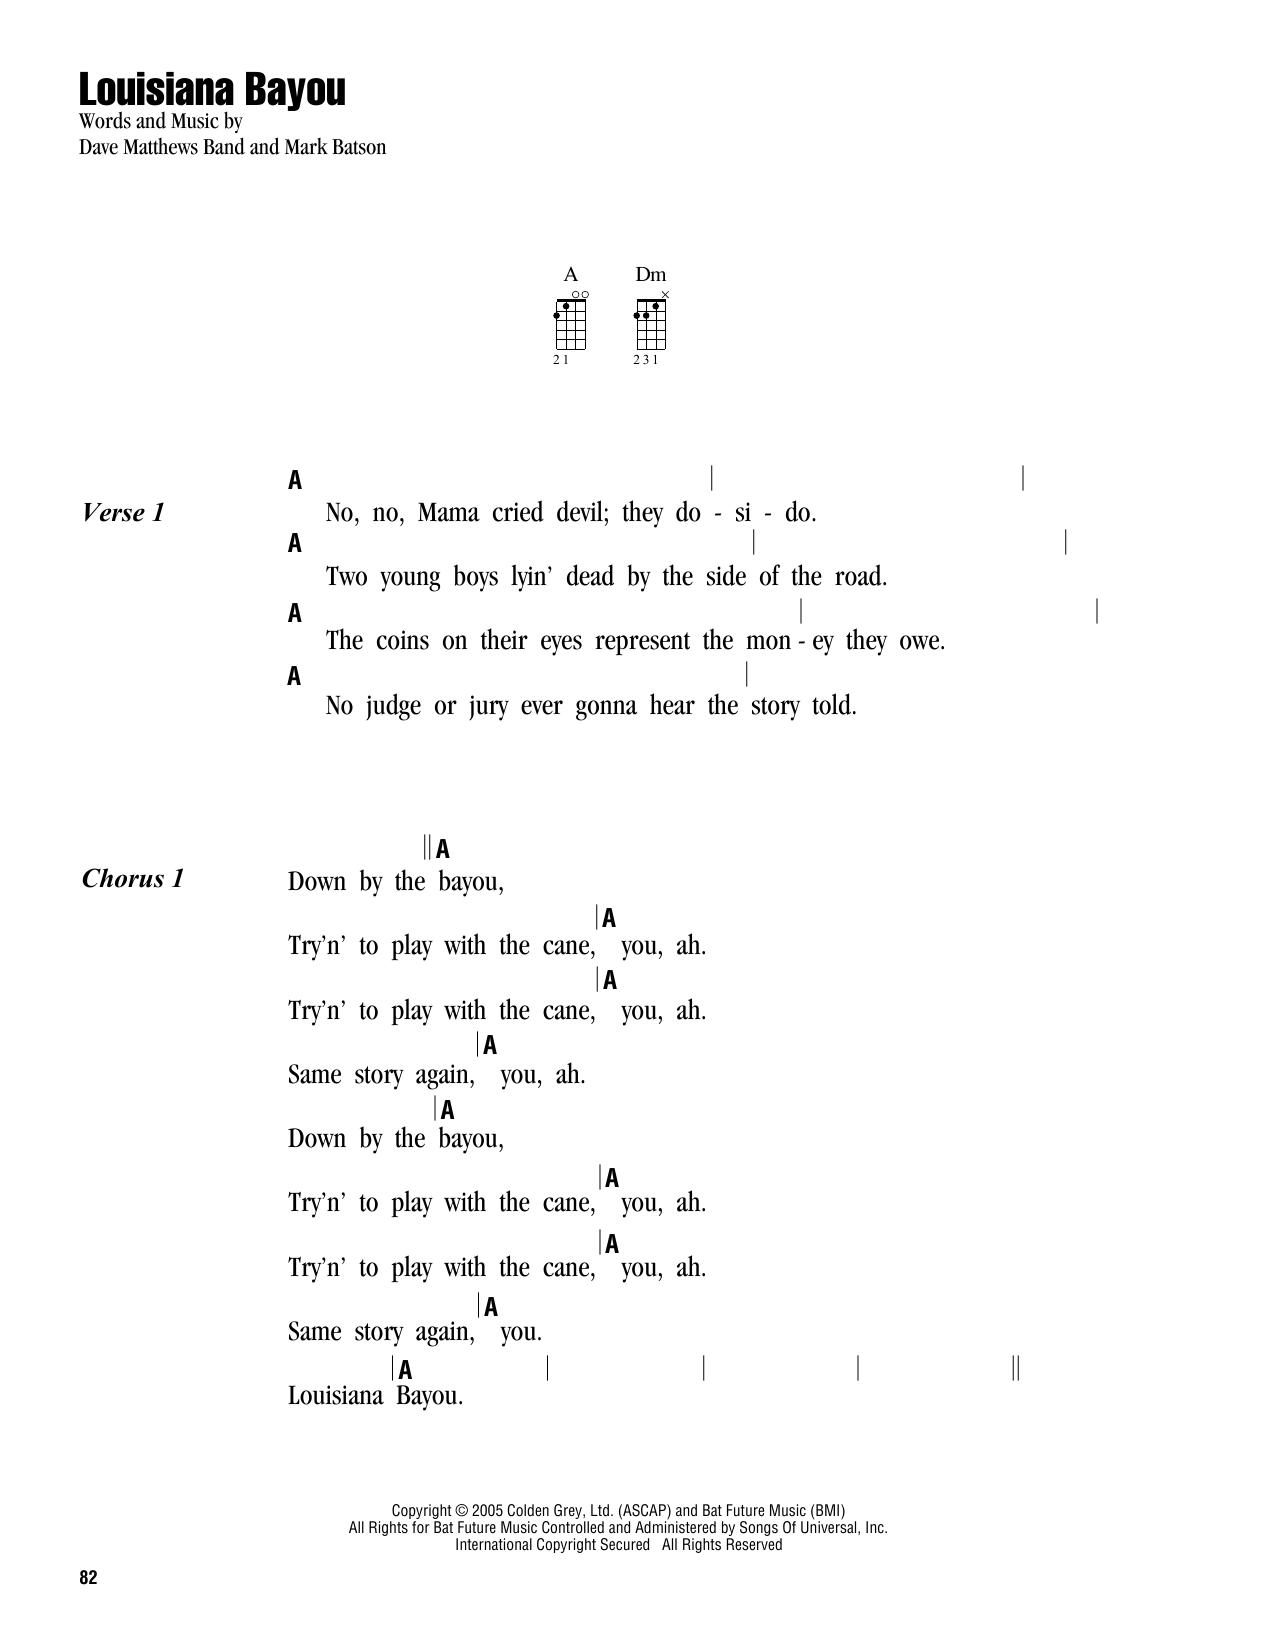 Tablature guitare Louisiana Bayou de Dave Matthews Band - Ukulele (strumming patterns)